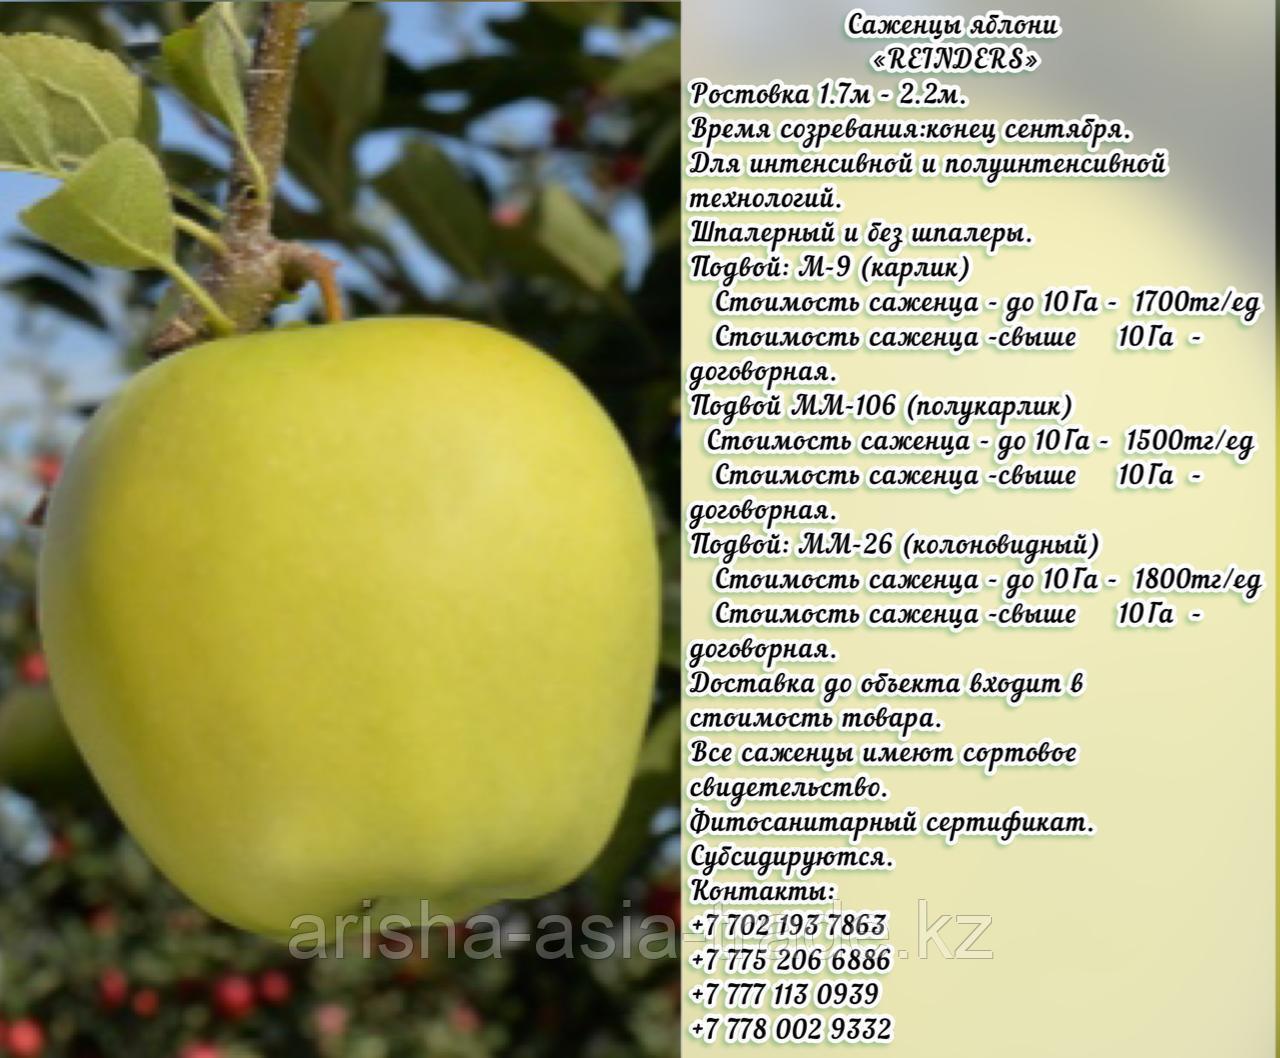 "Саженцы яблони ""Rainders"" (Рэндэрс) мм 106 Сербия"